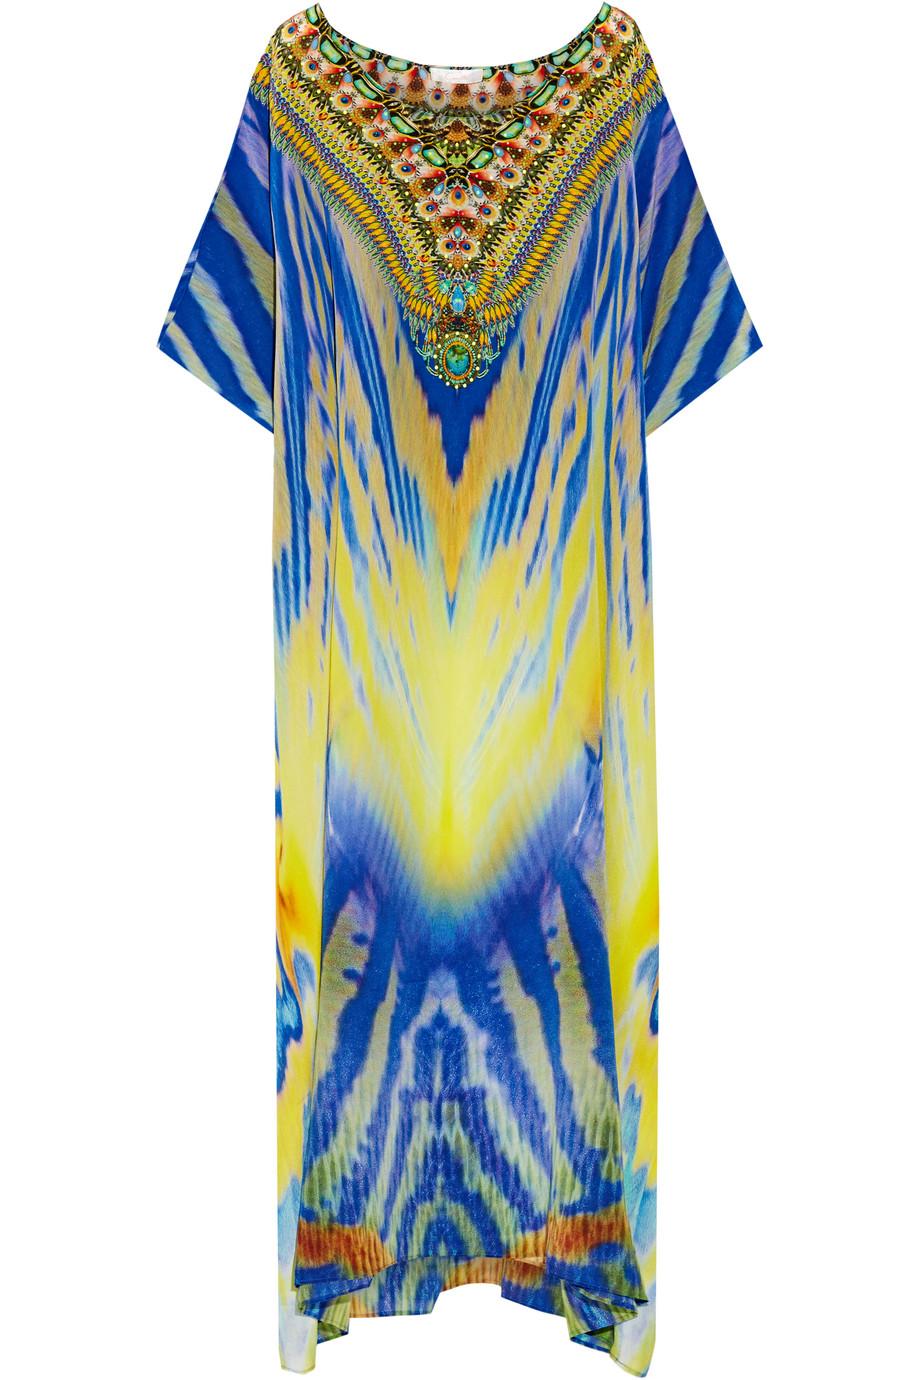 Meltemi Breeze Embellished Printed Silk-Crepe Kaftan, Bright Blue/Yellow, Women's - Printed, Size: One size